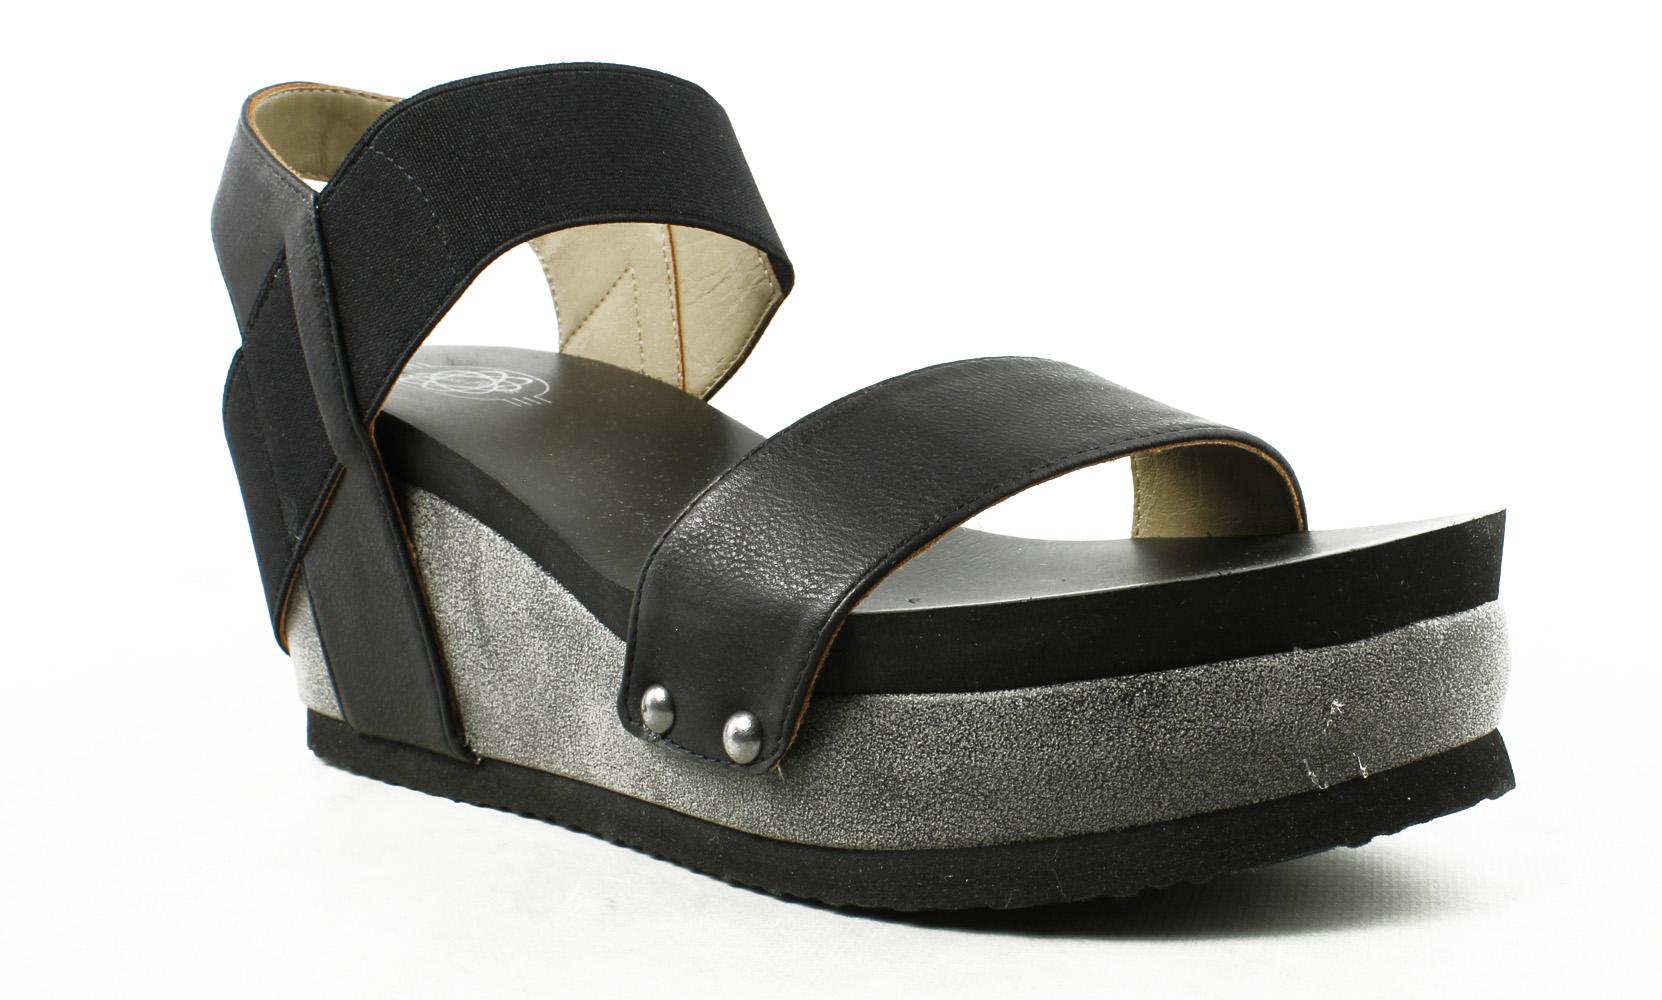 Hokus Pokus Heels Womens Black Ankle Strap Heels Pokus Size 10 (369937) 4572a4